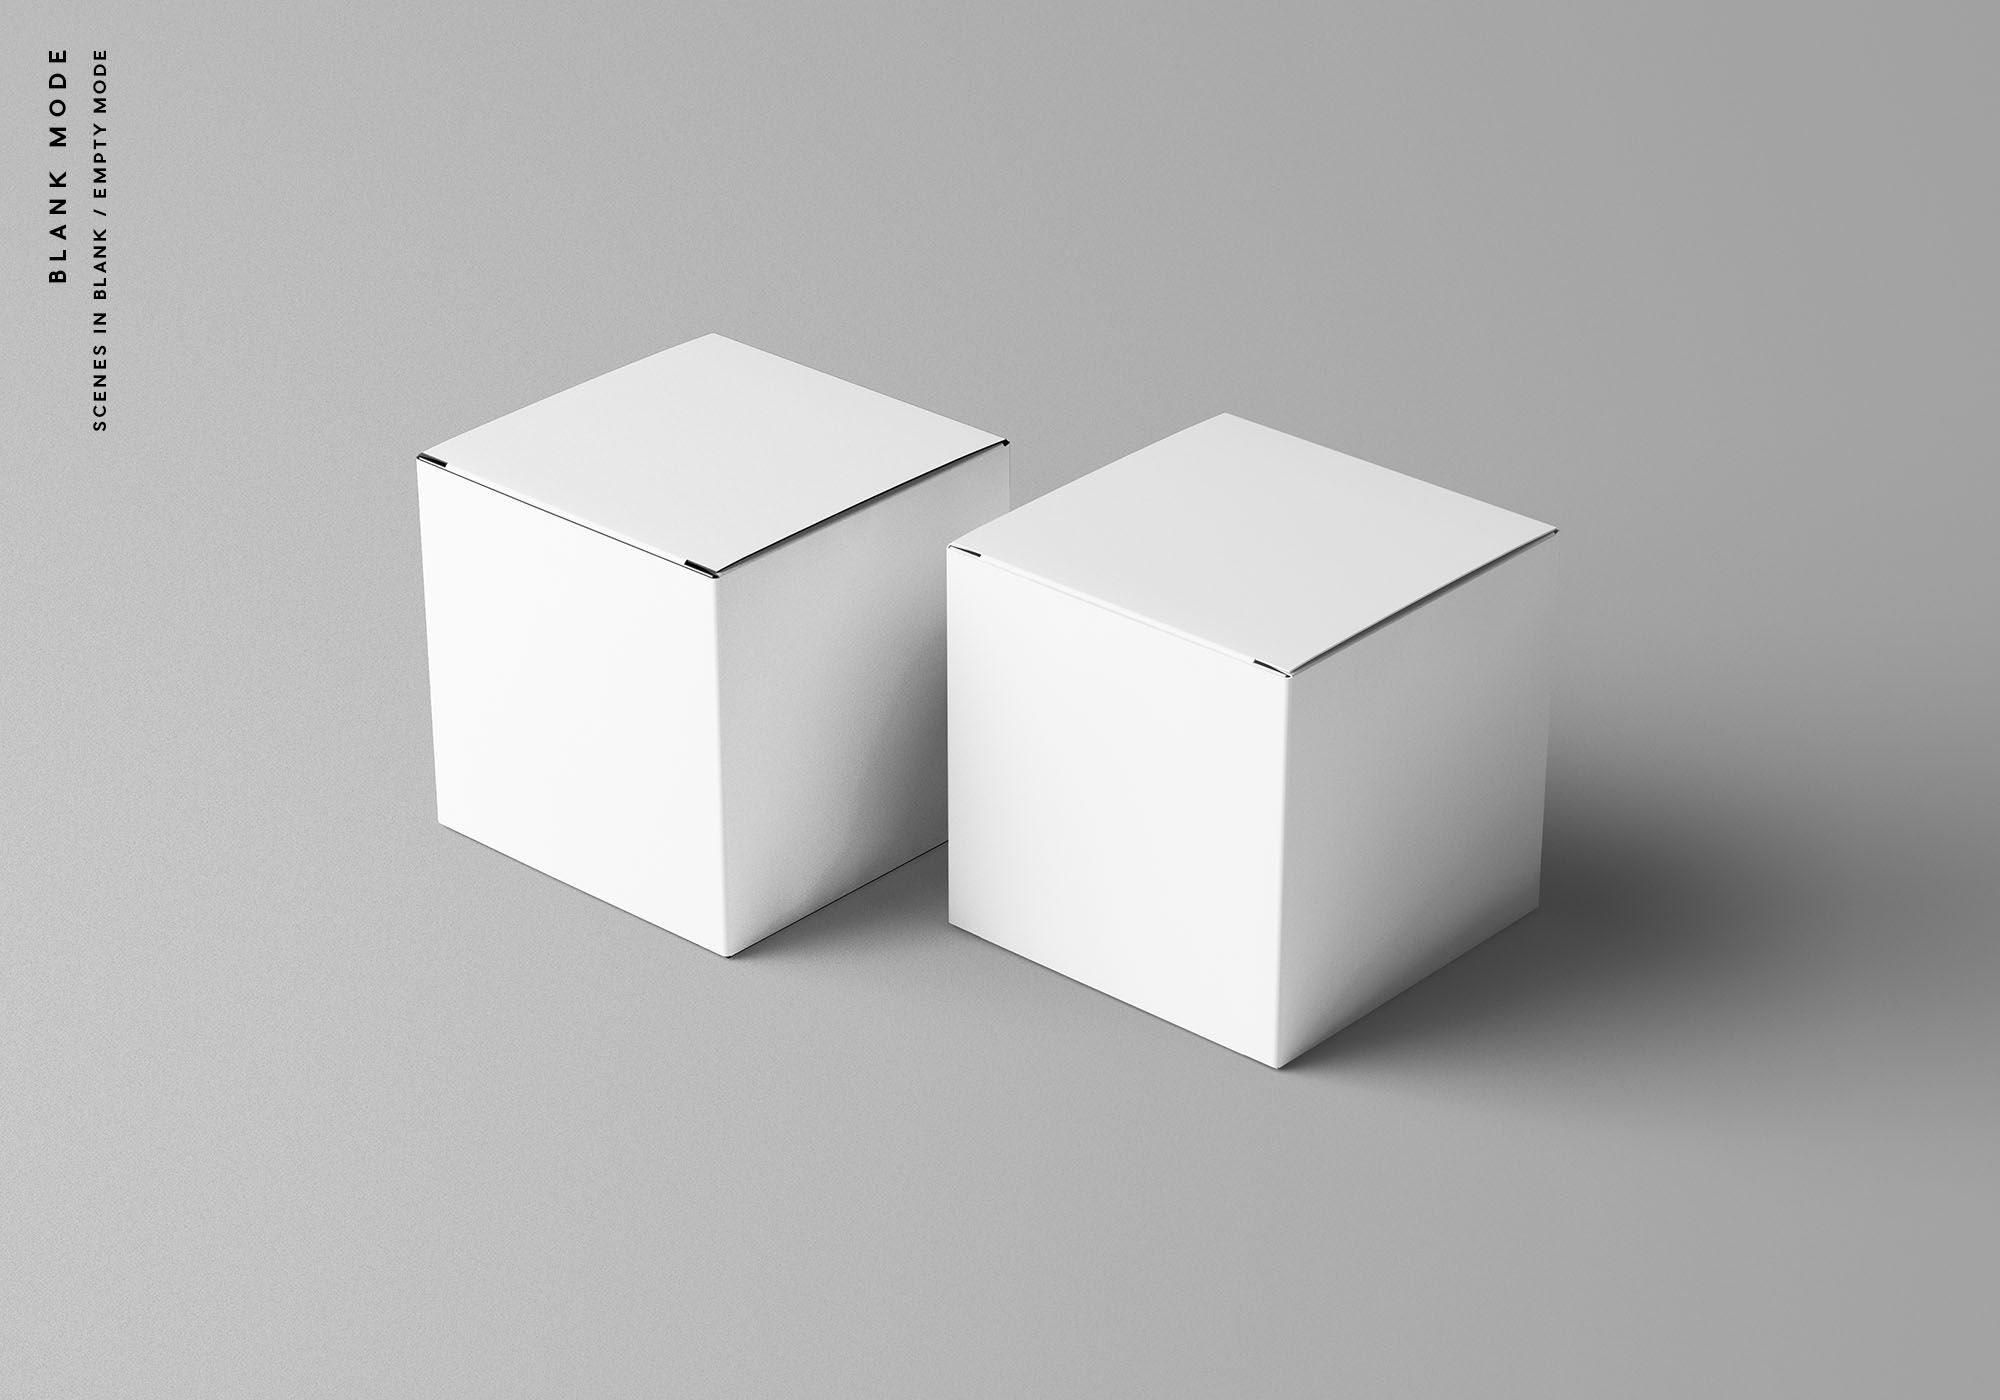 Download Square Package Box Mockup In 2021 Box Mockup Mockup Box Packaging